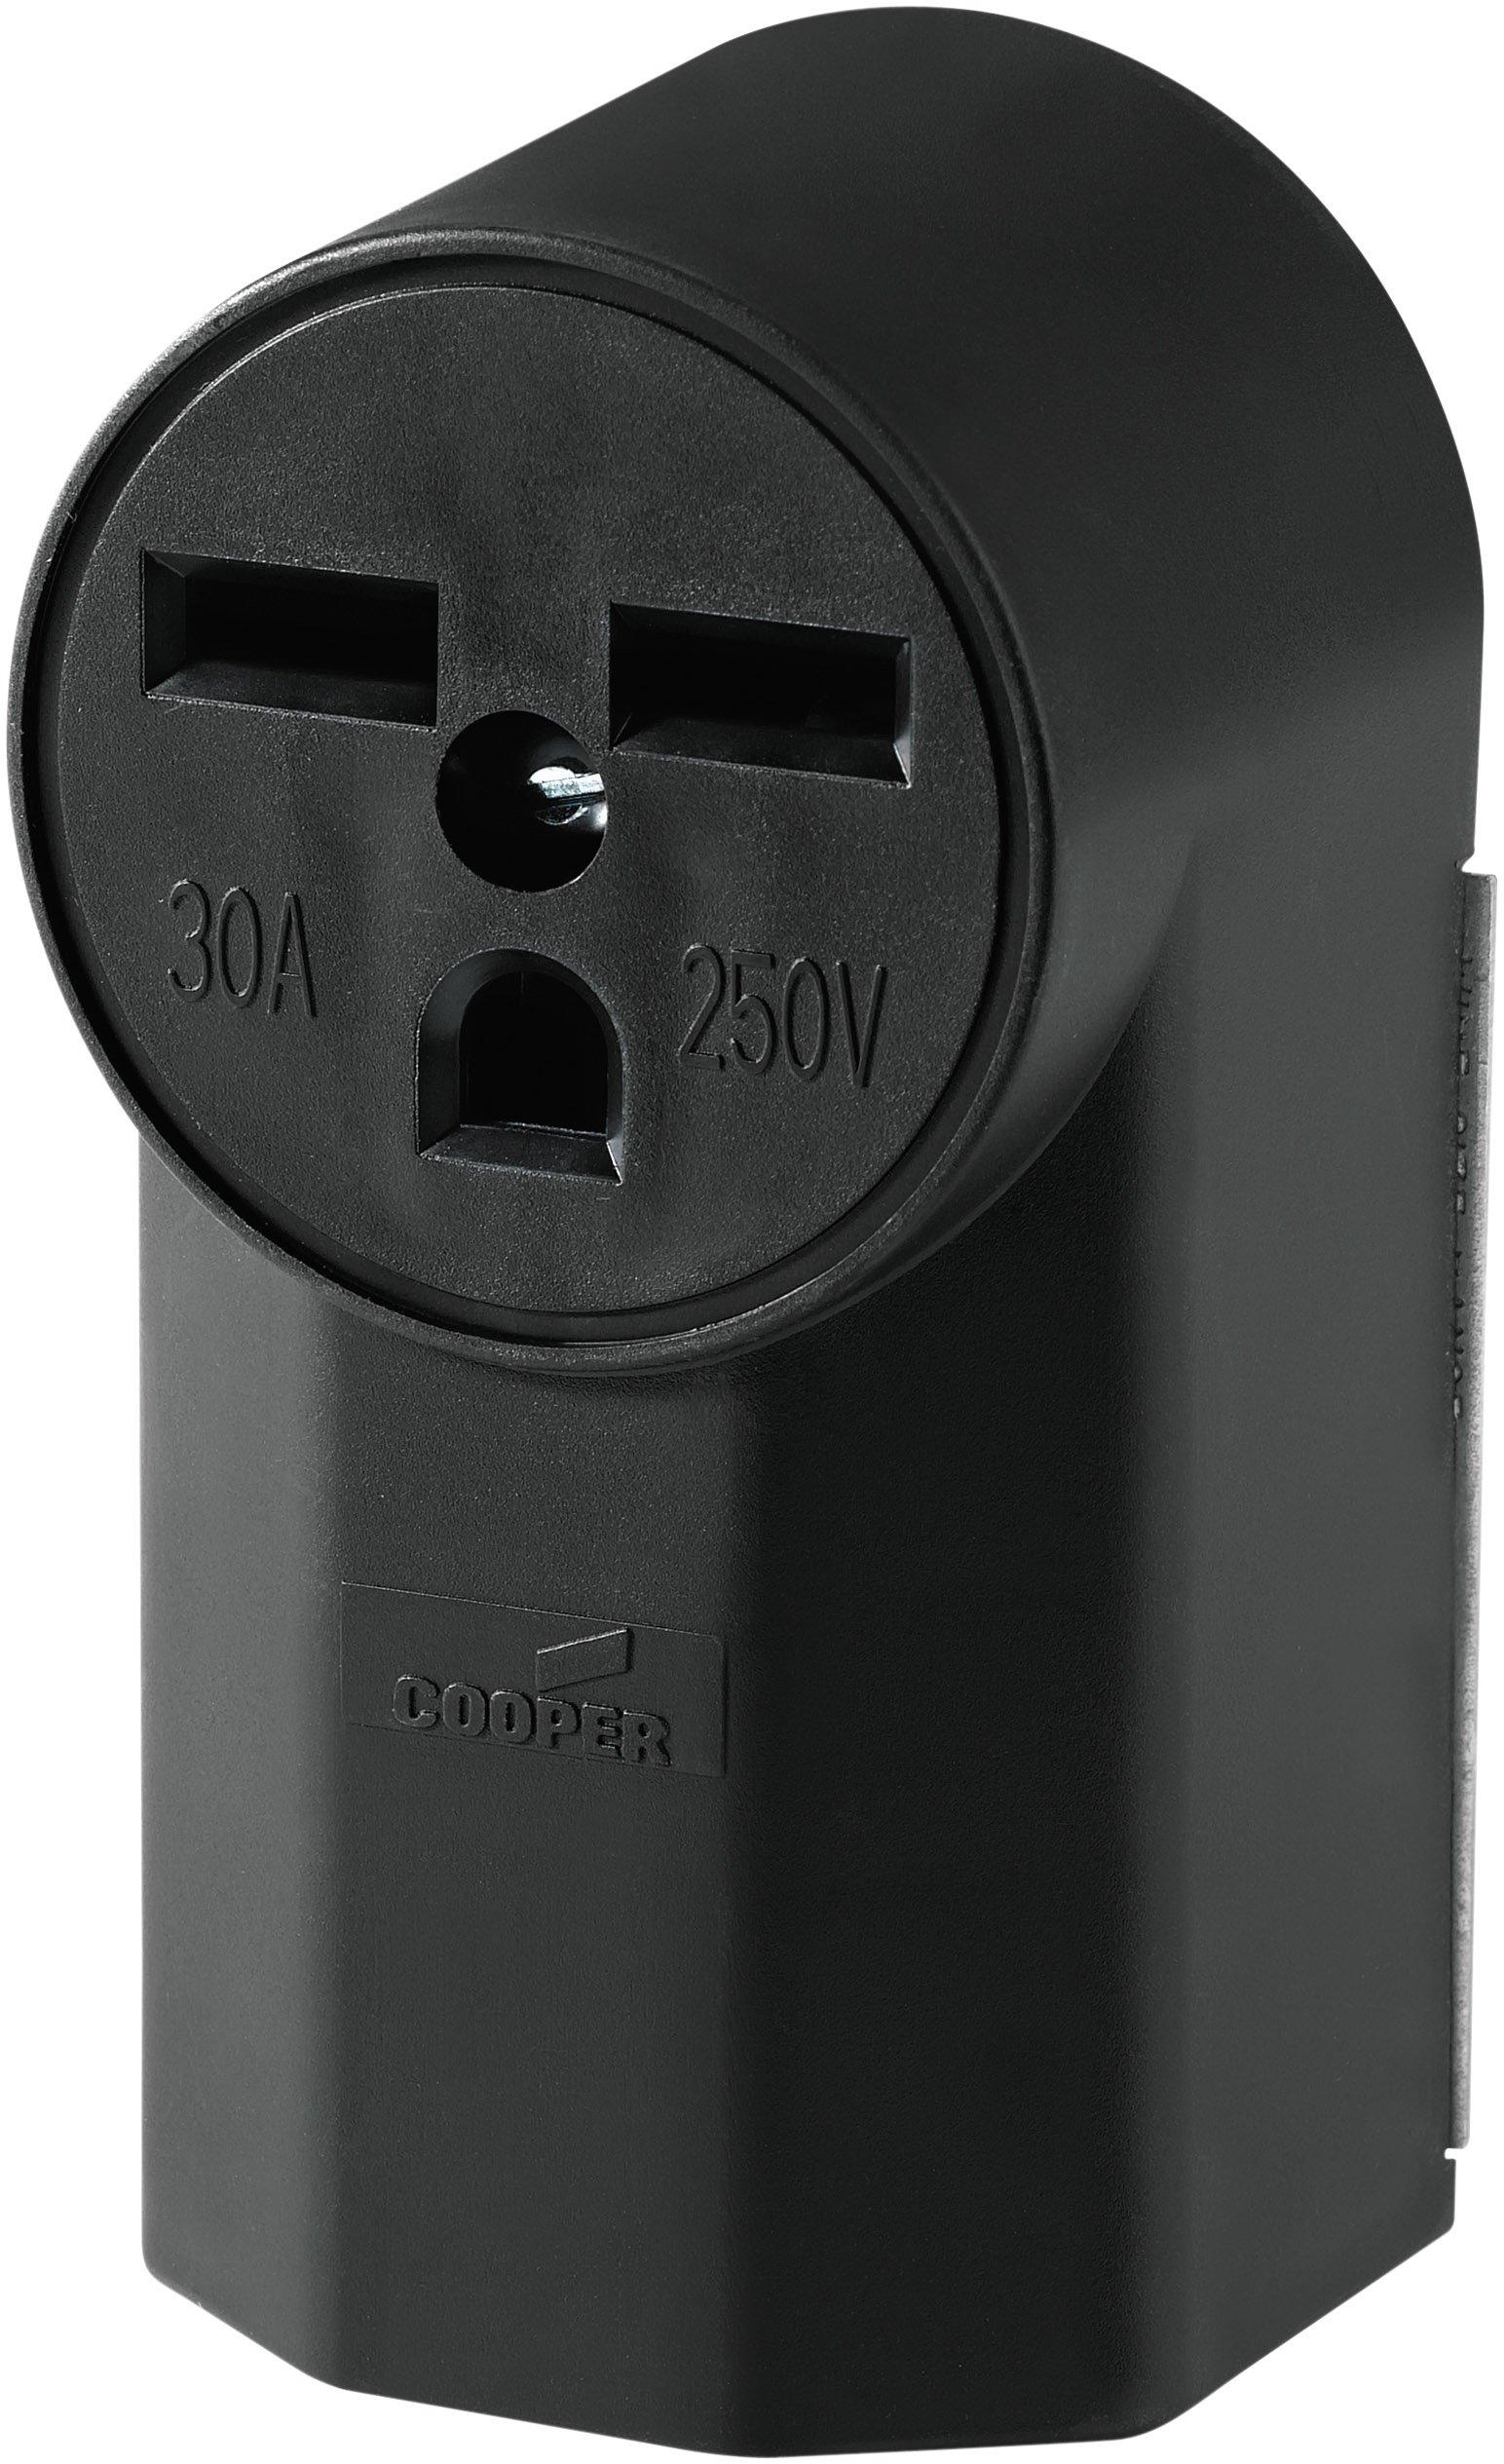 Eaton WD1232 30-Amp 2-Pole 3-Wire 240-Volt Surface Mount Power Receptacle, Black